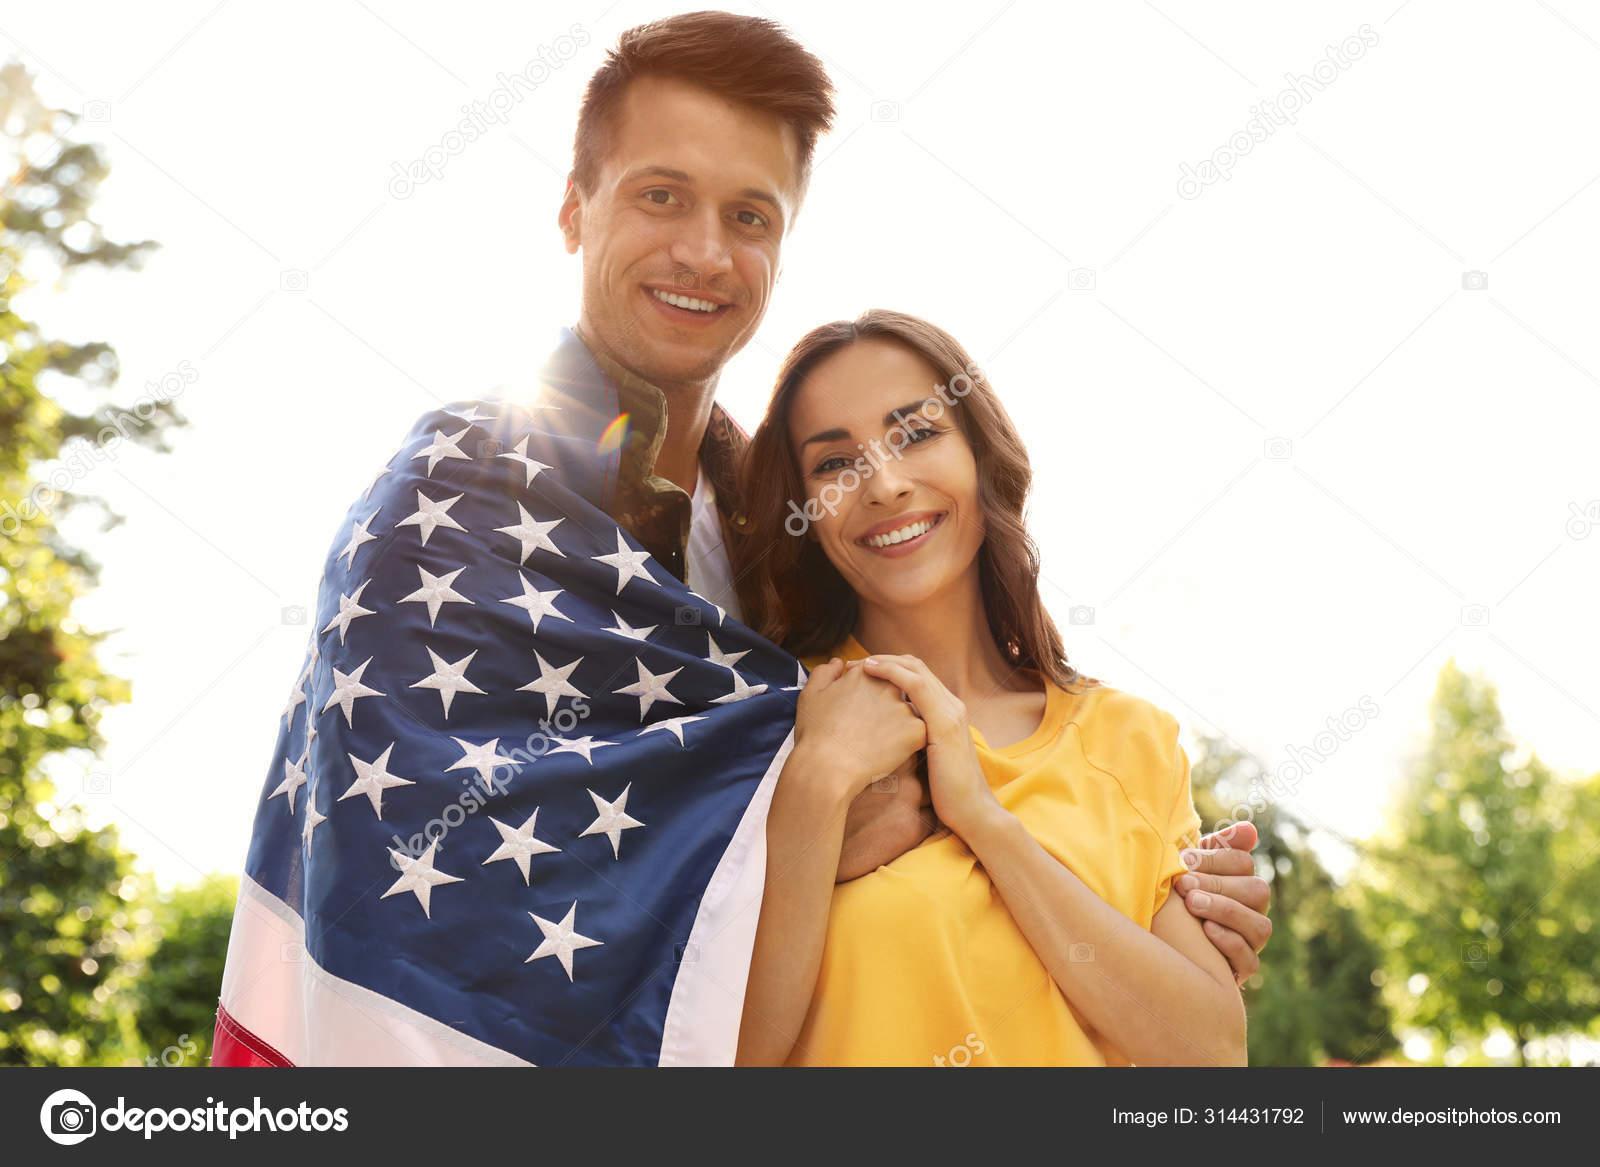 dating în militar